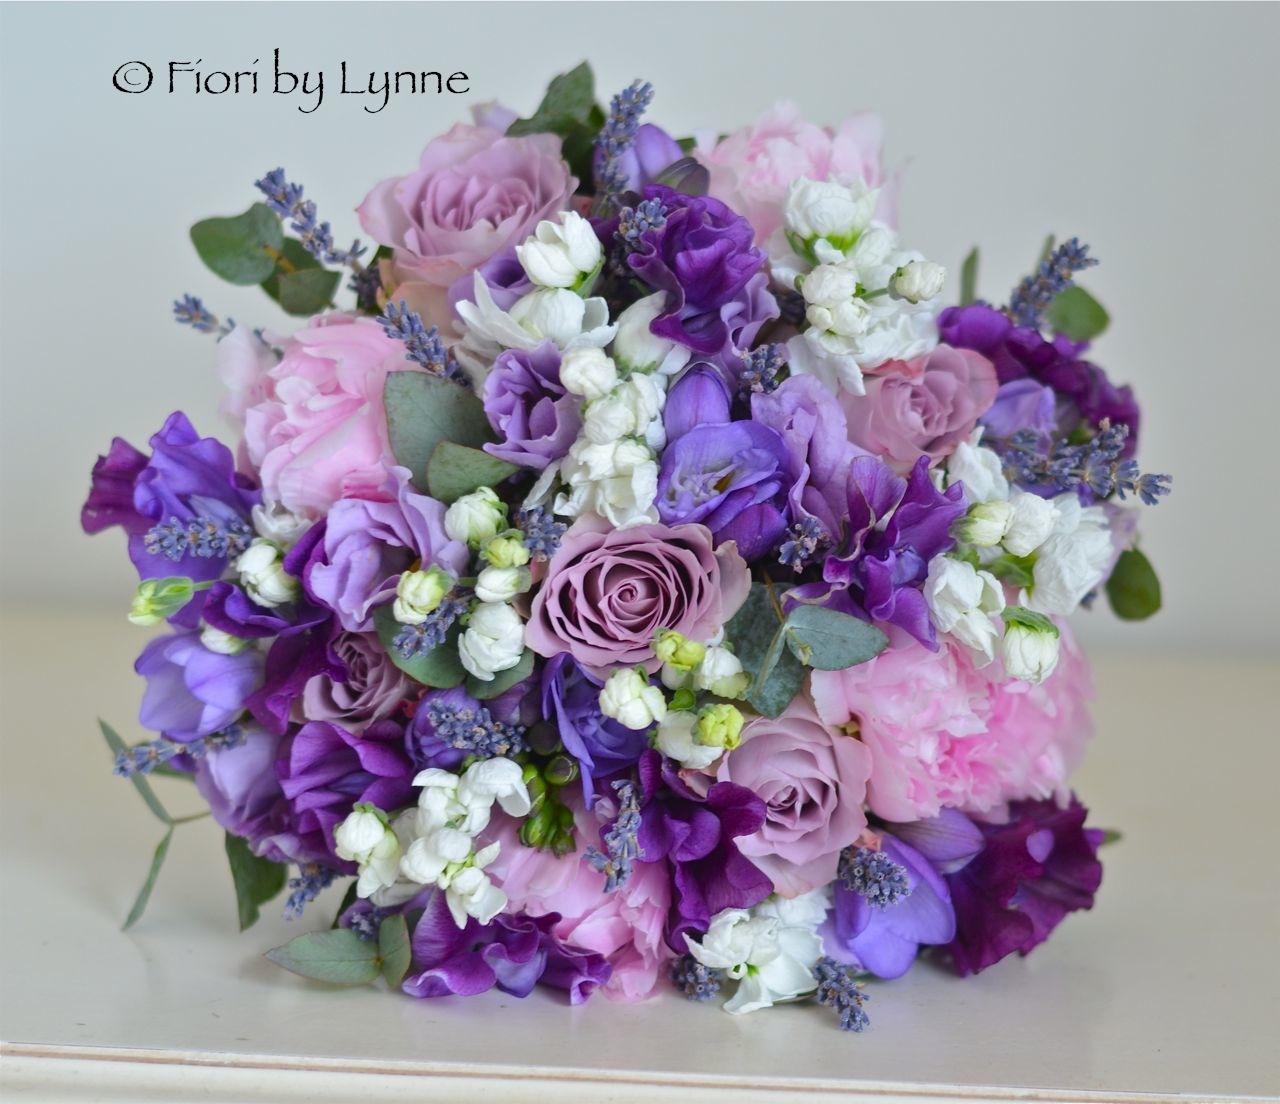 Wedding Flowers Blog: Lauren\'s Early Summer Lavender themed Wedding ...